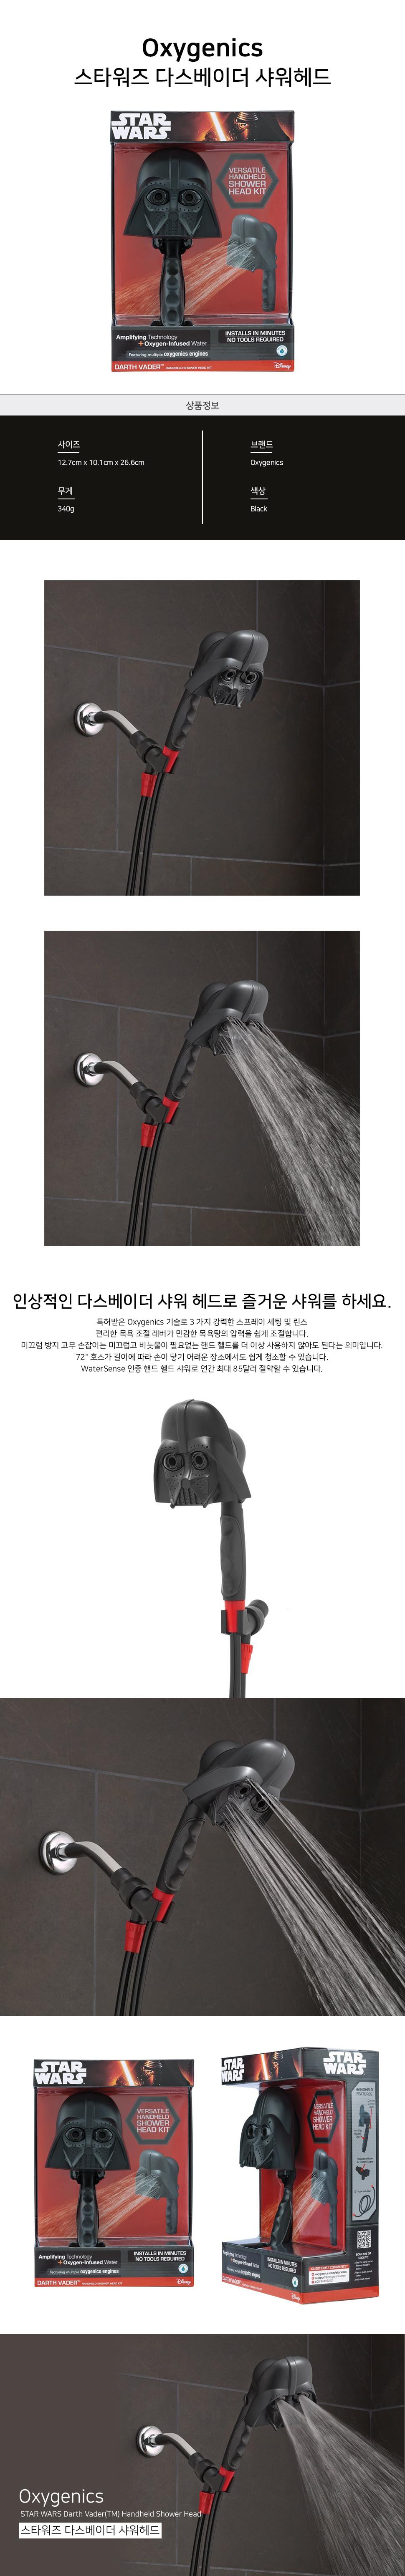 Oxygenics_Starwars_Darth_Vader_Shower_Head_01.jpg